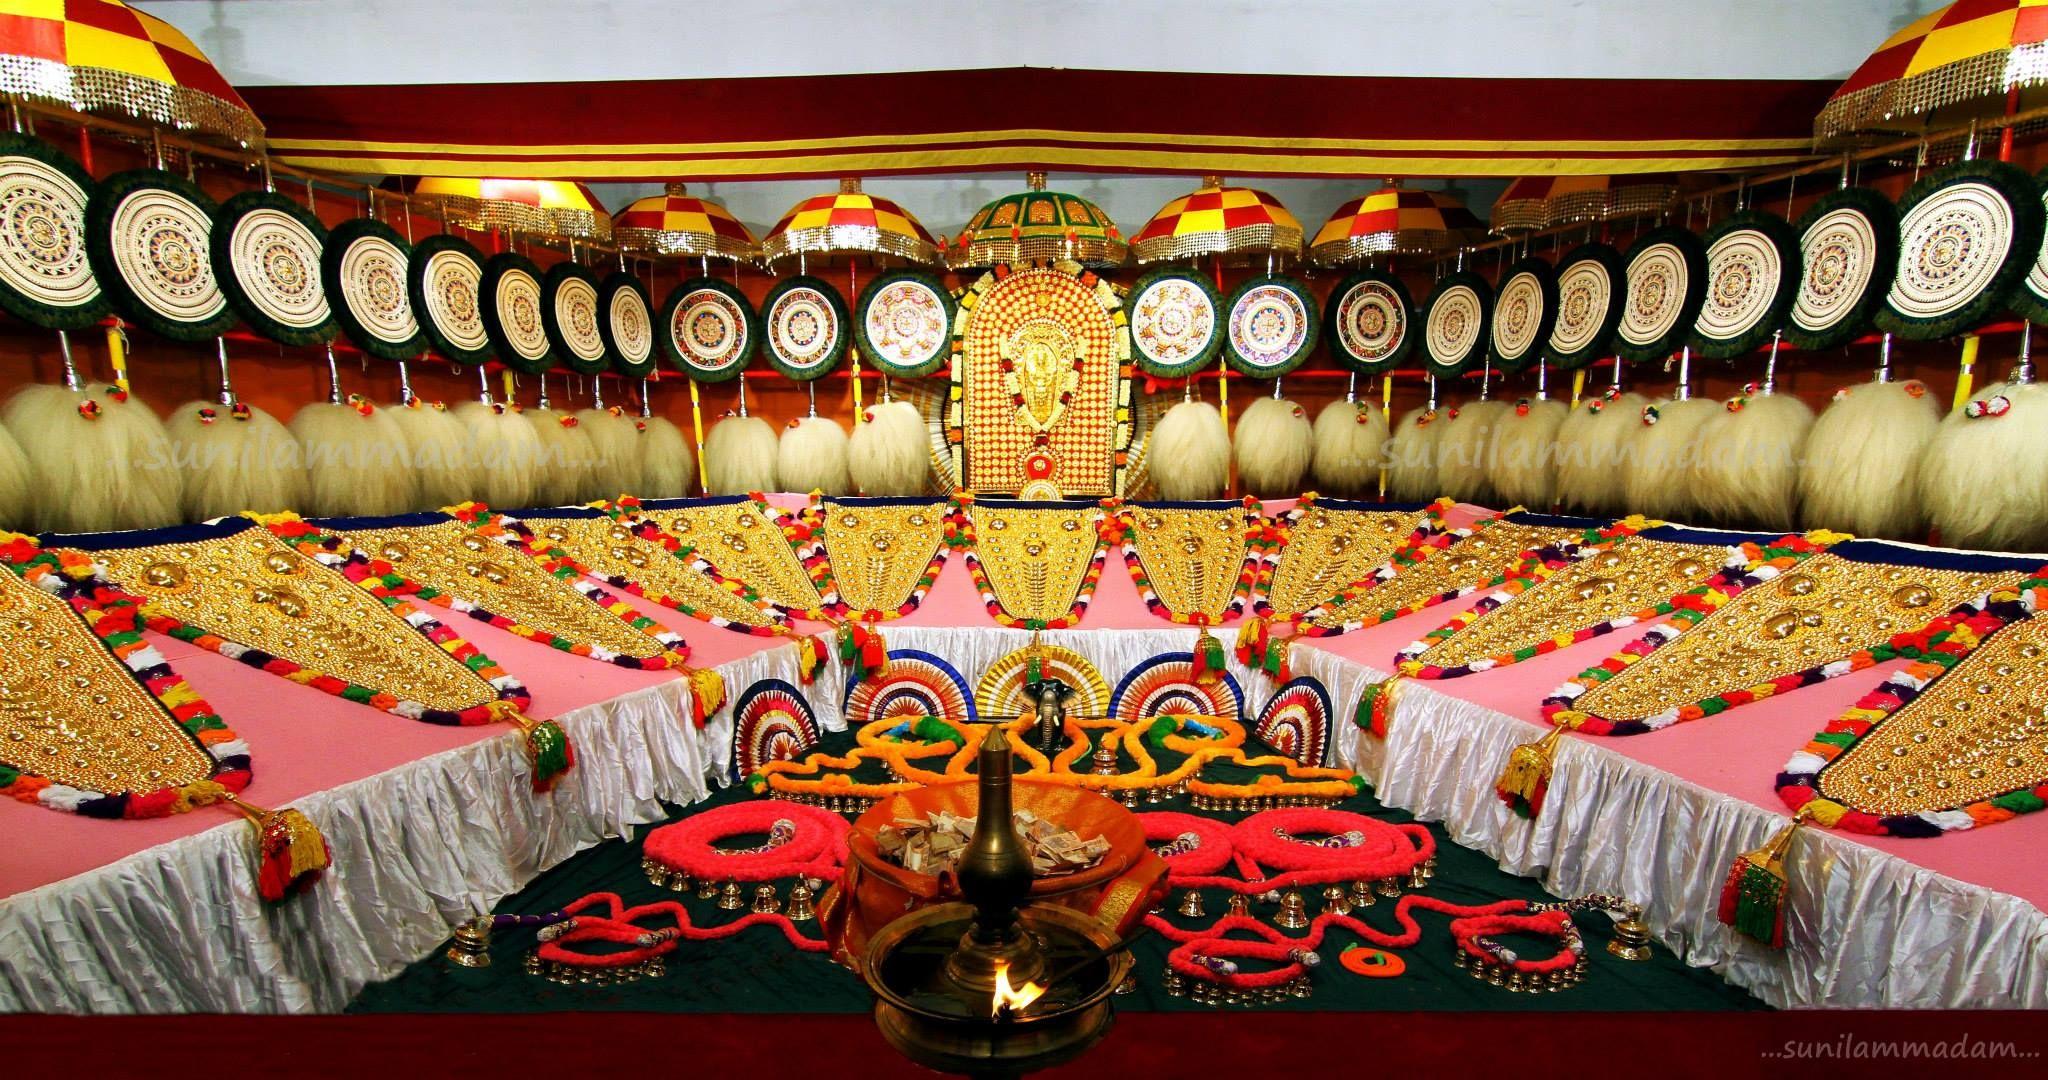 Paramekkavu Temple Elephant Decorative Items For Thrissur Pooram